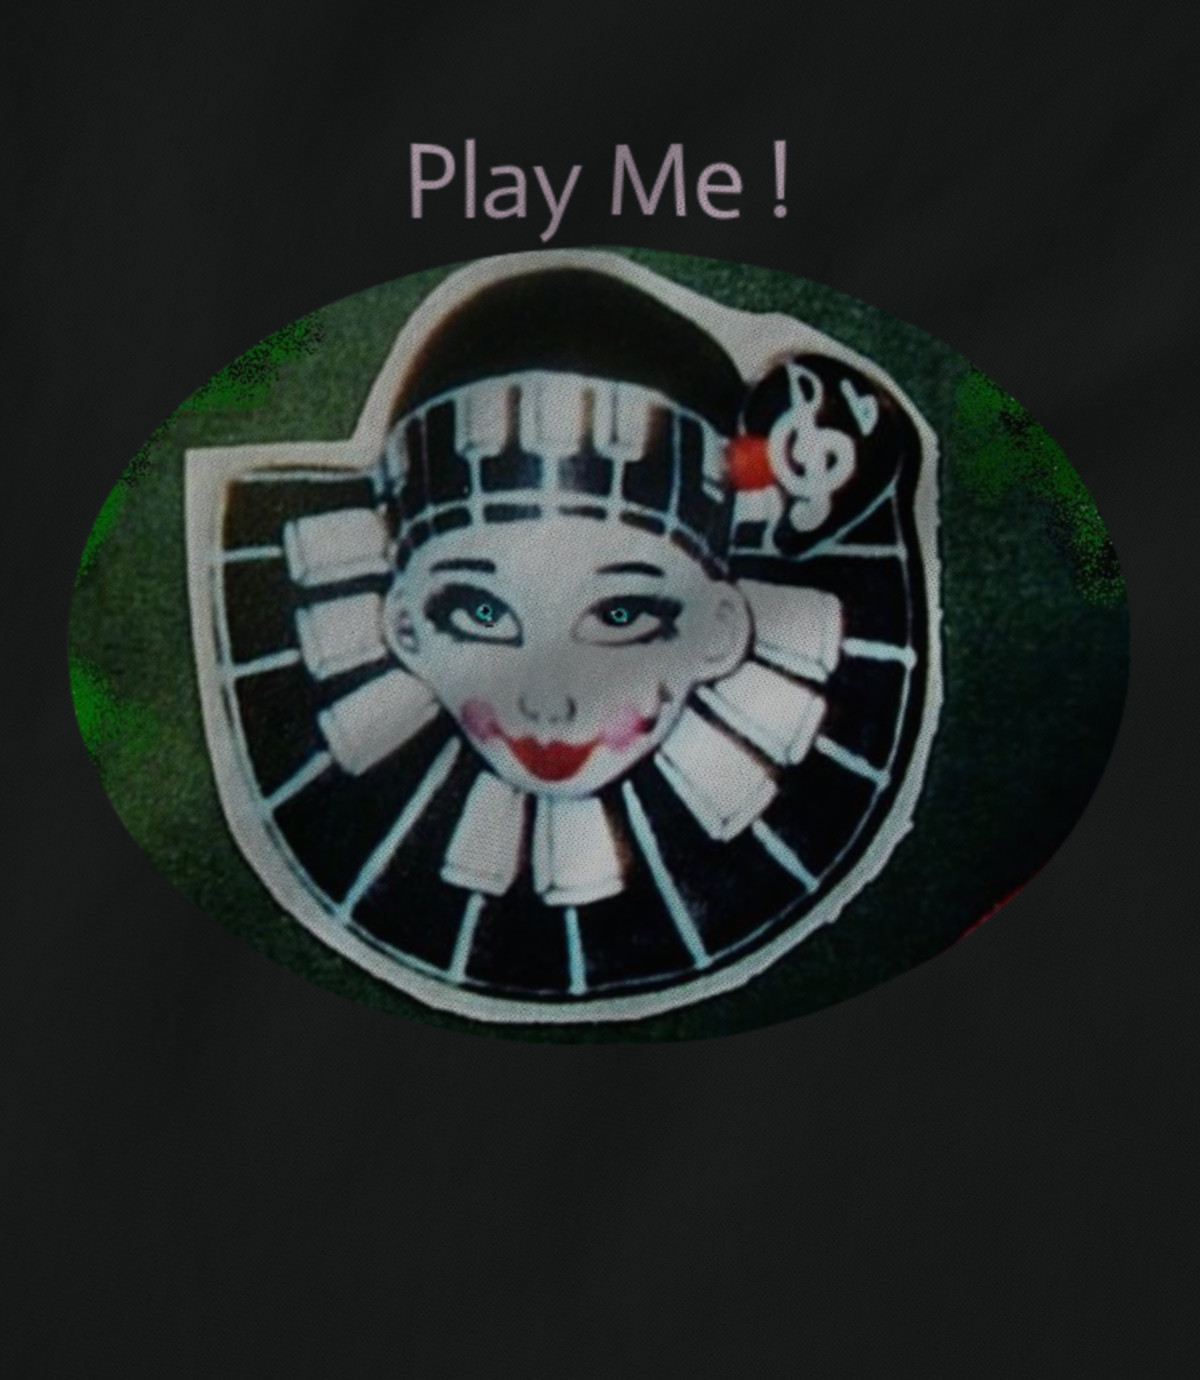 Matthew f  blowers iii play me   1505316769